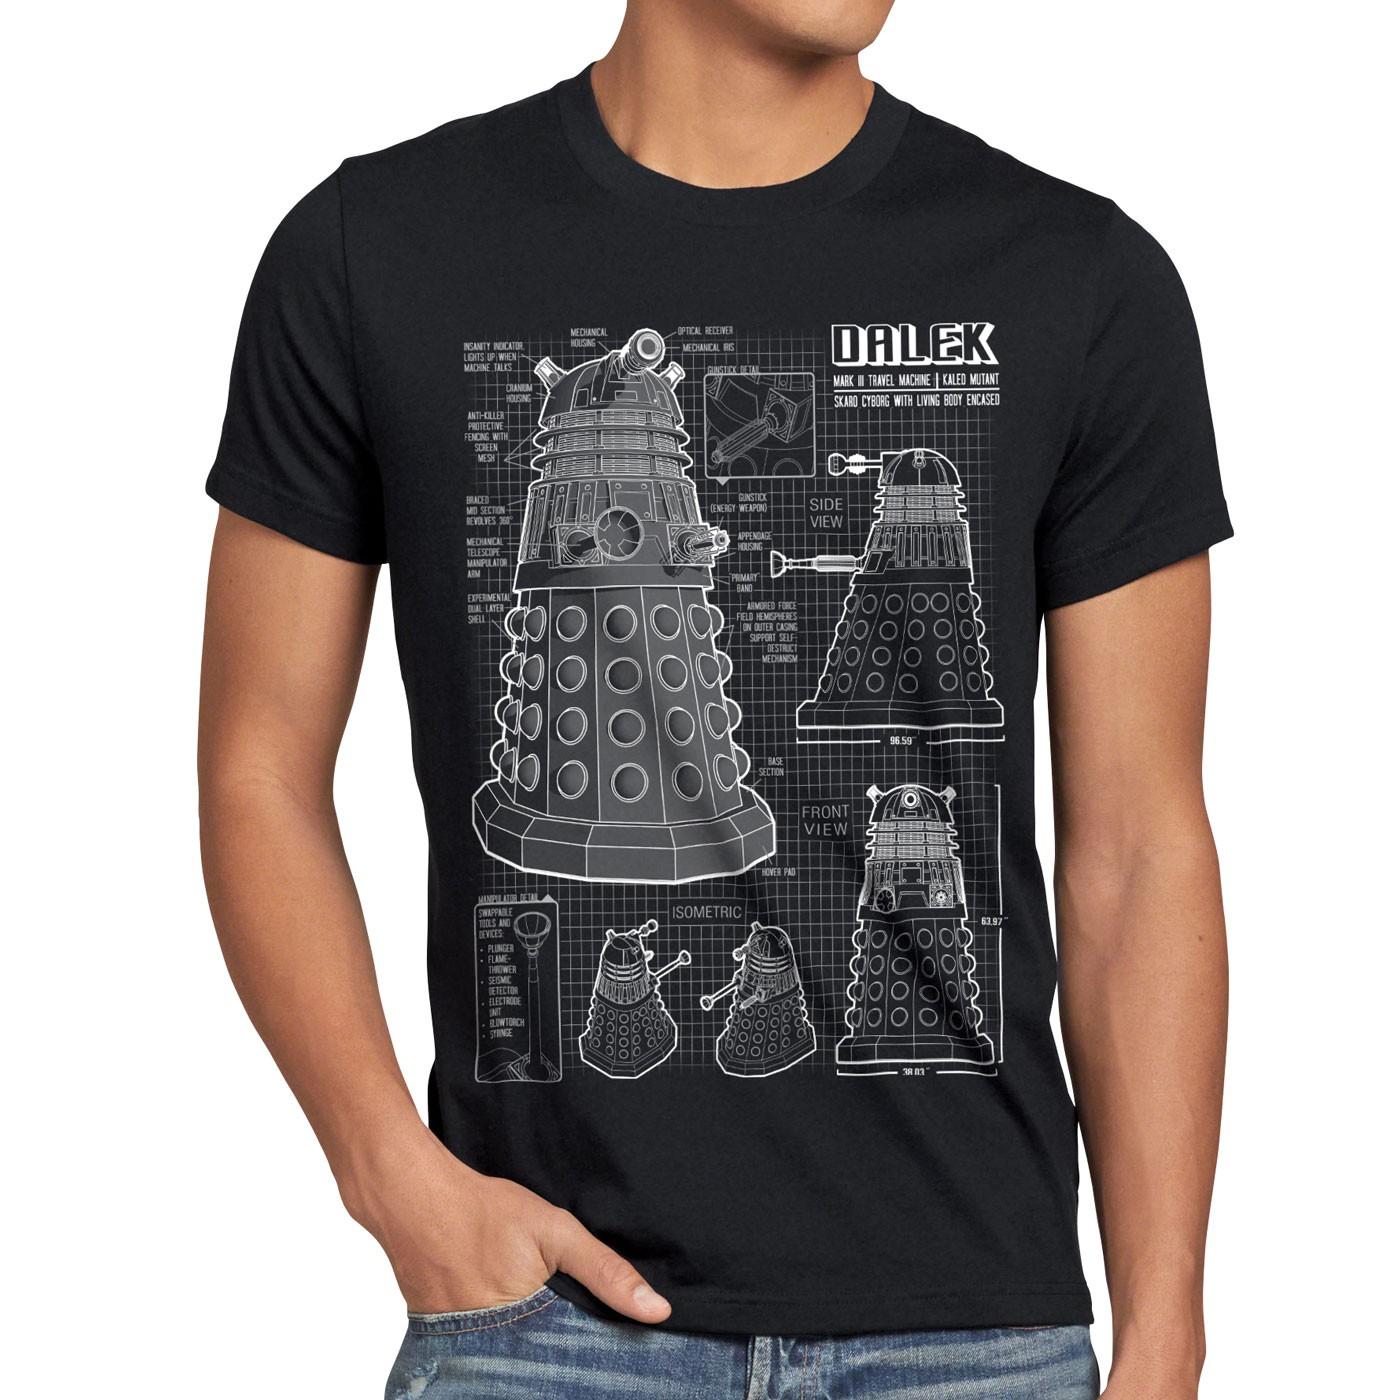 5920f92abe4b3 ... Dalek T-Shirt Hommes OMS Time Police Doctor Box Box Box Space Dr TV  temporel ...